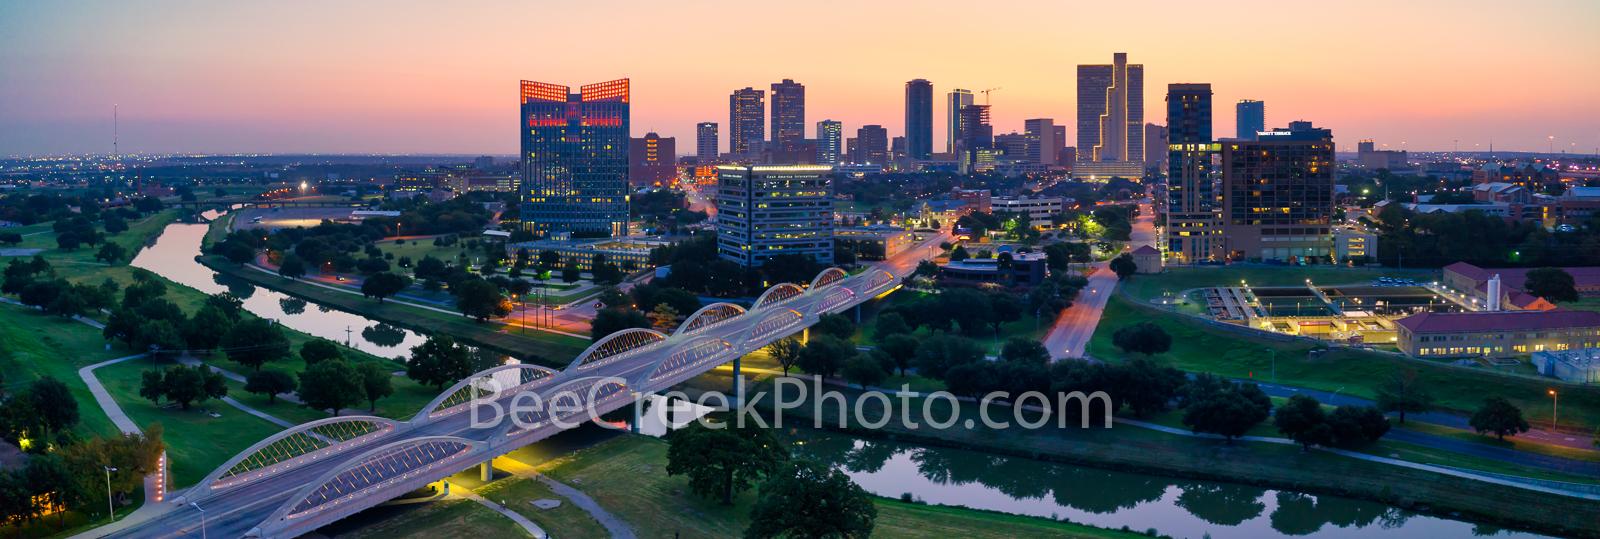 Fort Worth, Skyline, skylines, Ft. Worth, dawn, downtown, sunrise, seventh street bridge, 7th street bridge, Trinity river, Texas, panorama, pano, city of fort worth, , photo